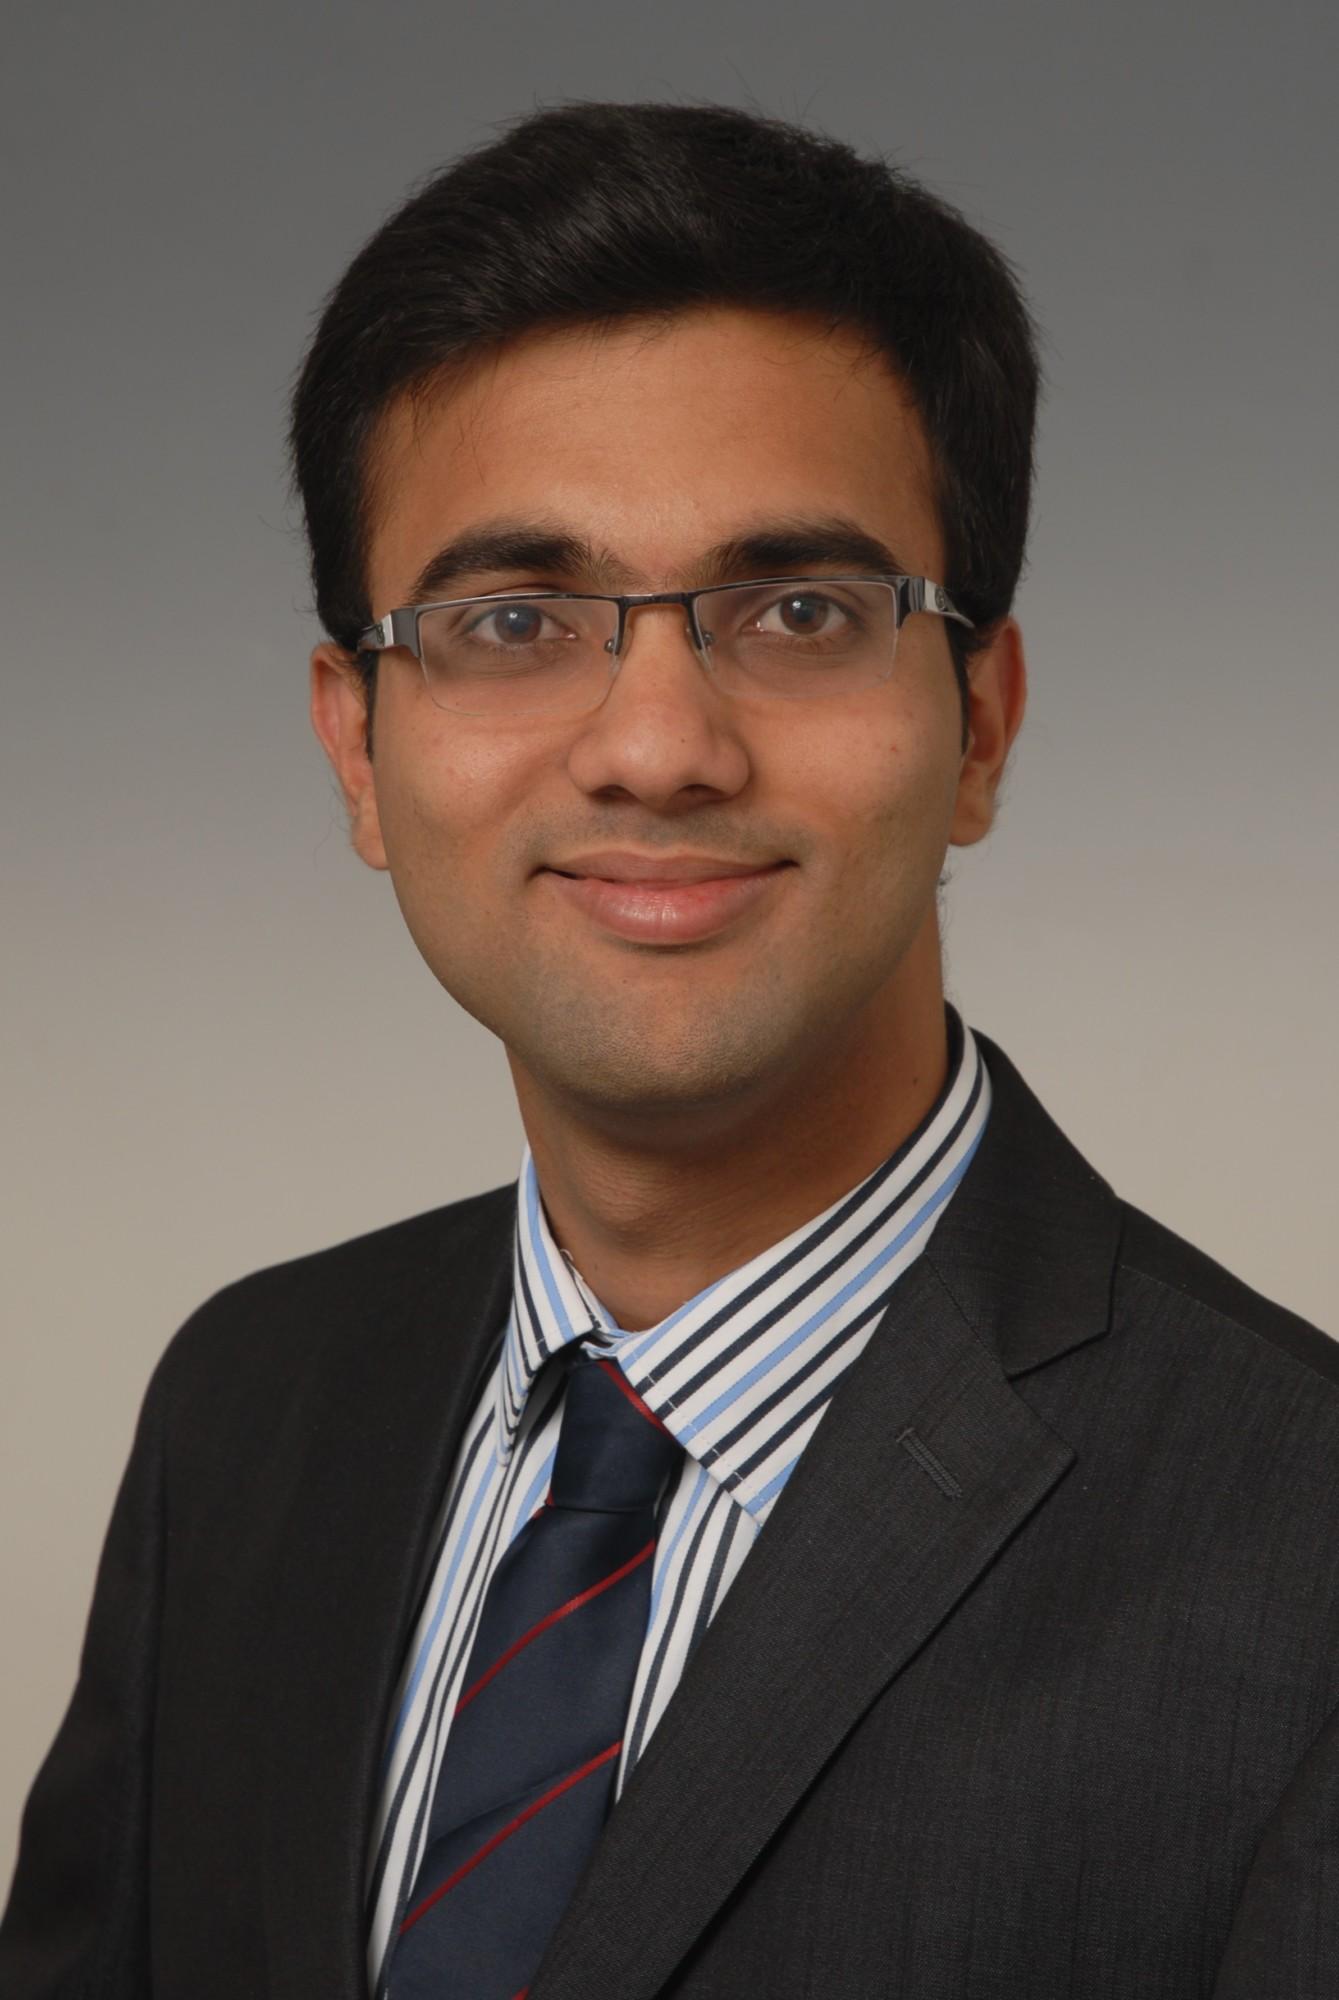 M.Sc. Ajay Poonjal Pai